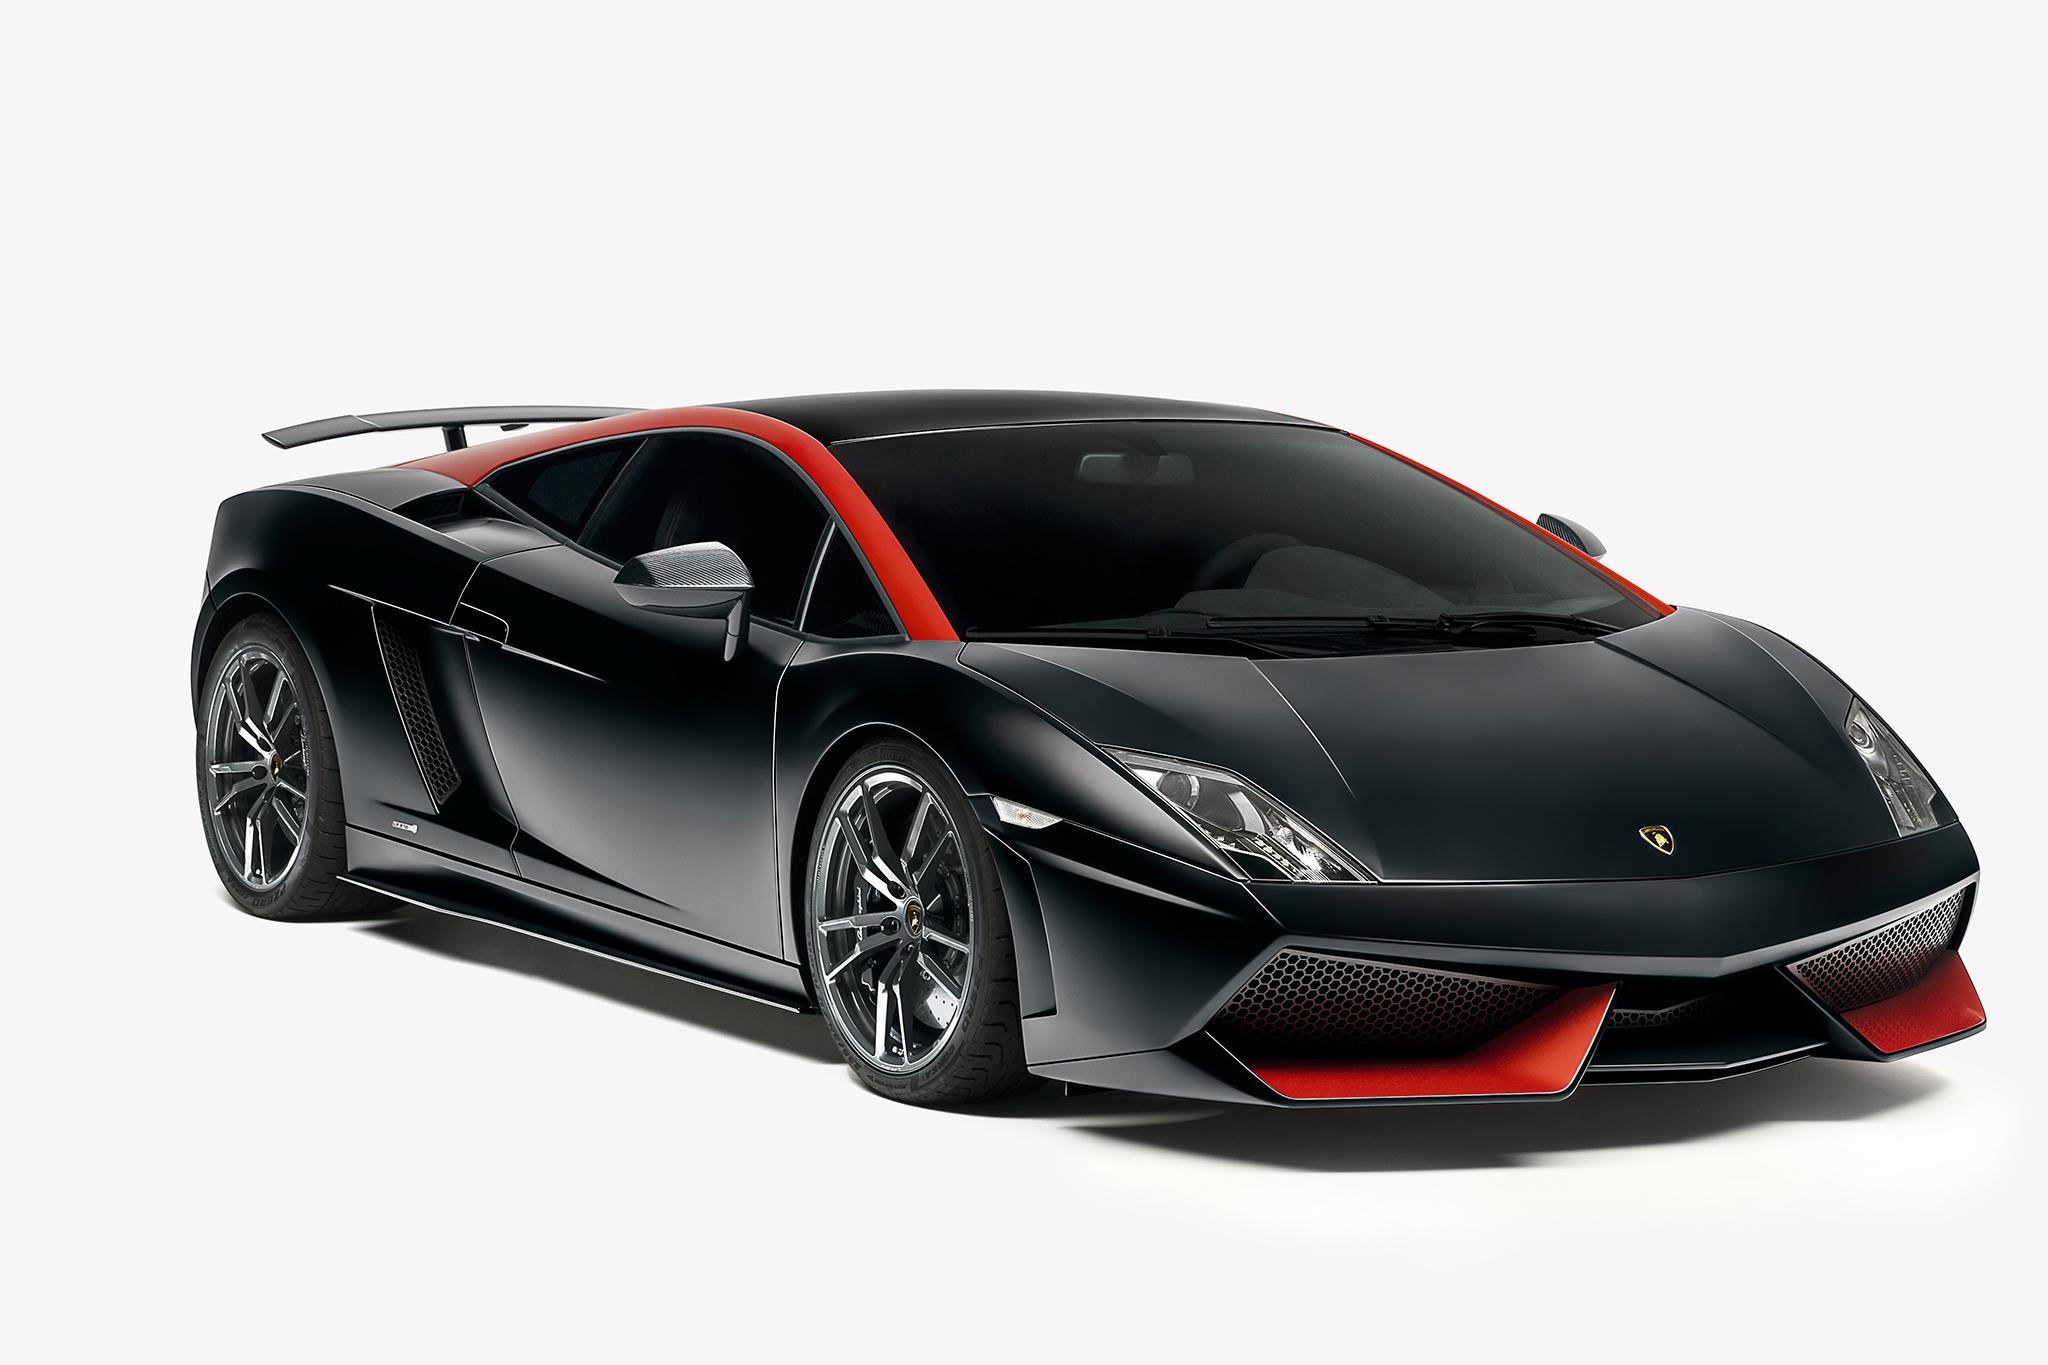 HD Quality Wallpaper   Collection: Vehicles, 2048x1365 Lamborghini Gallardo